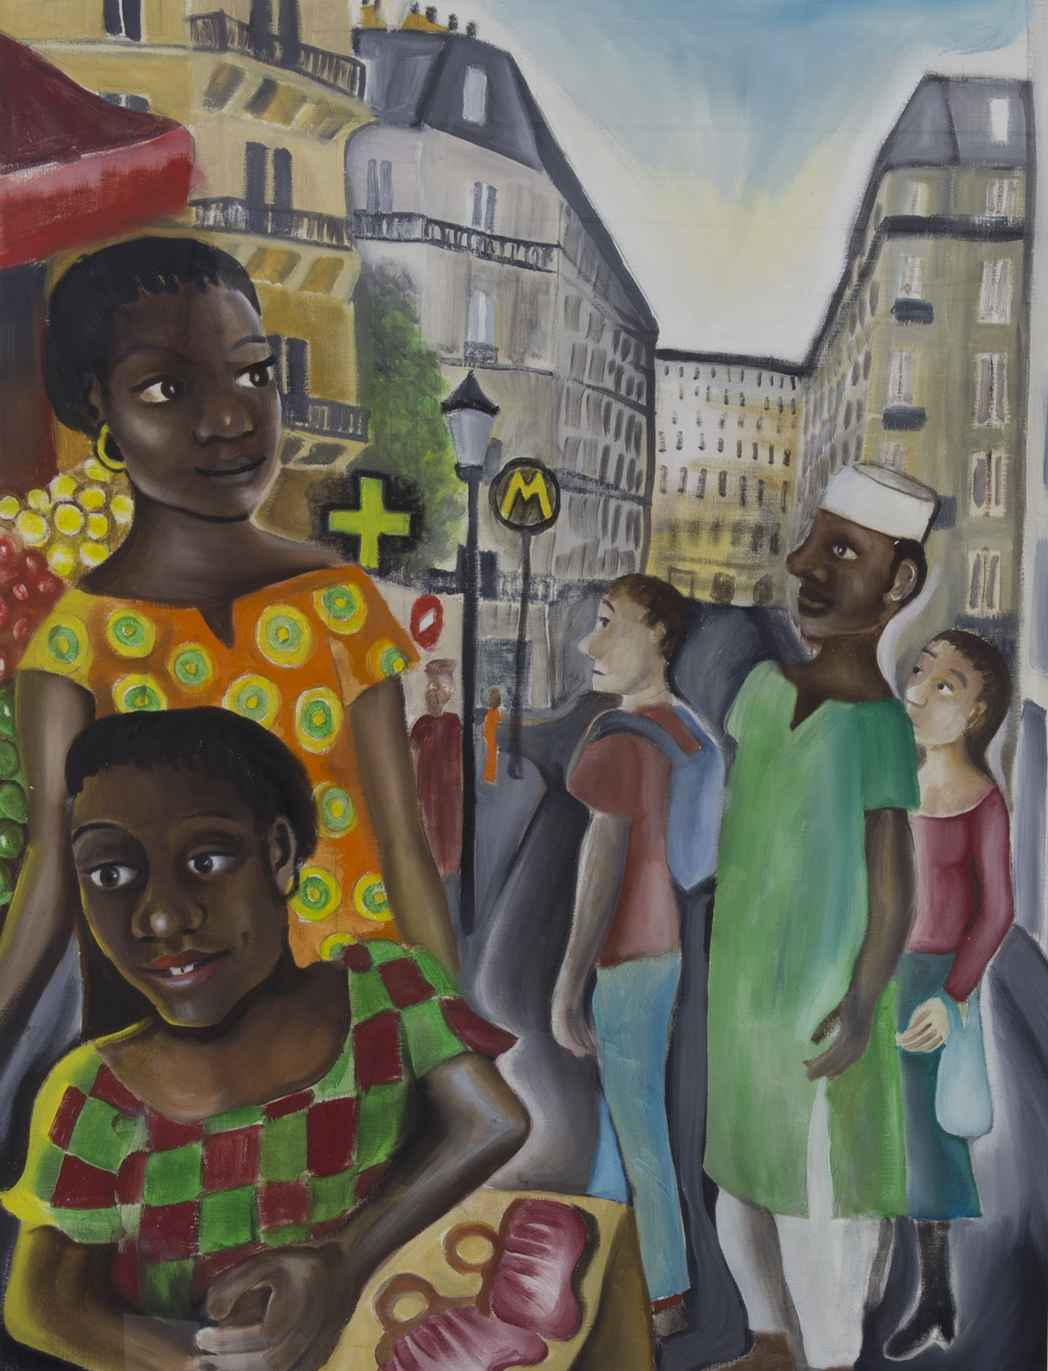 Woman at Marche Dejean by Ms. Rebecca Vincenzi - Masterpiece Online